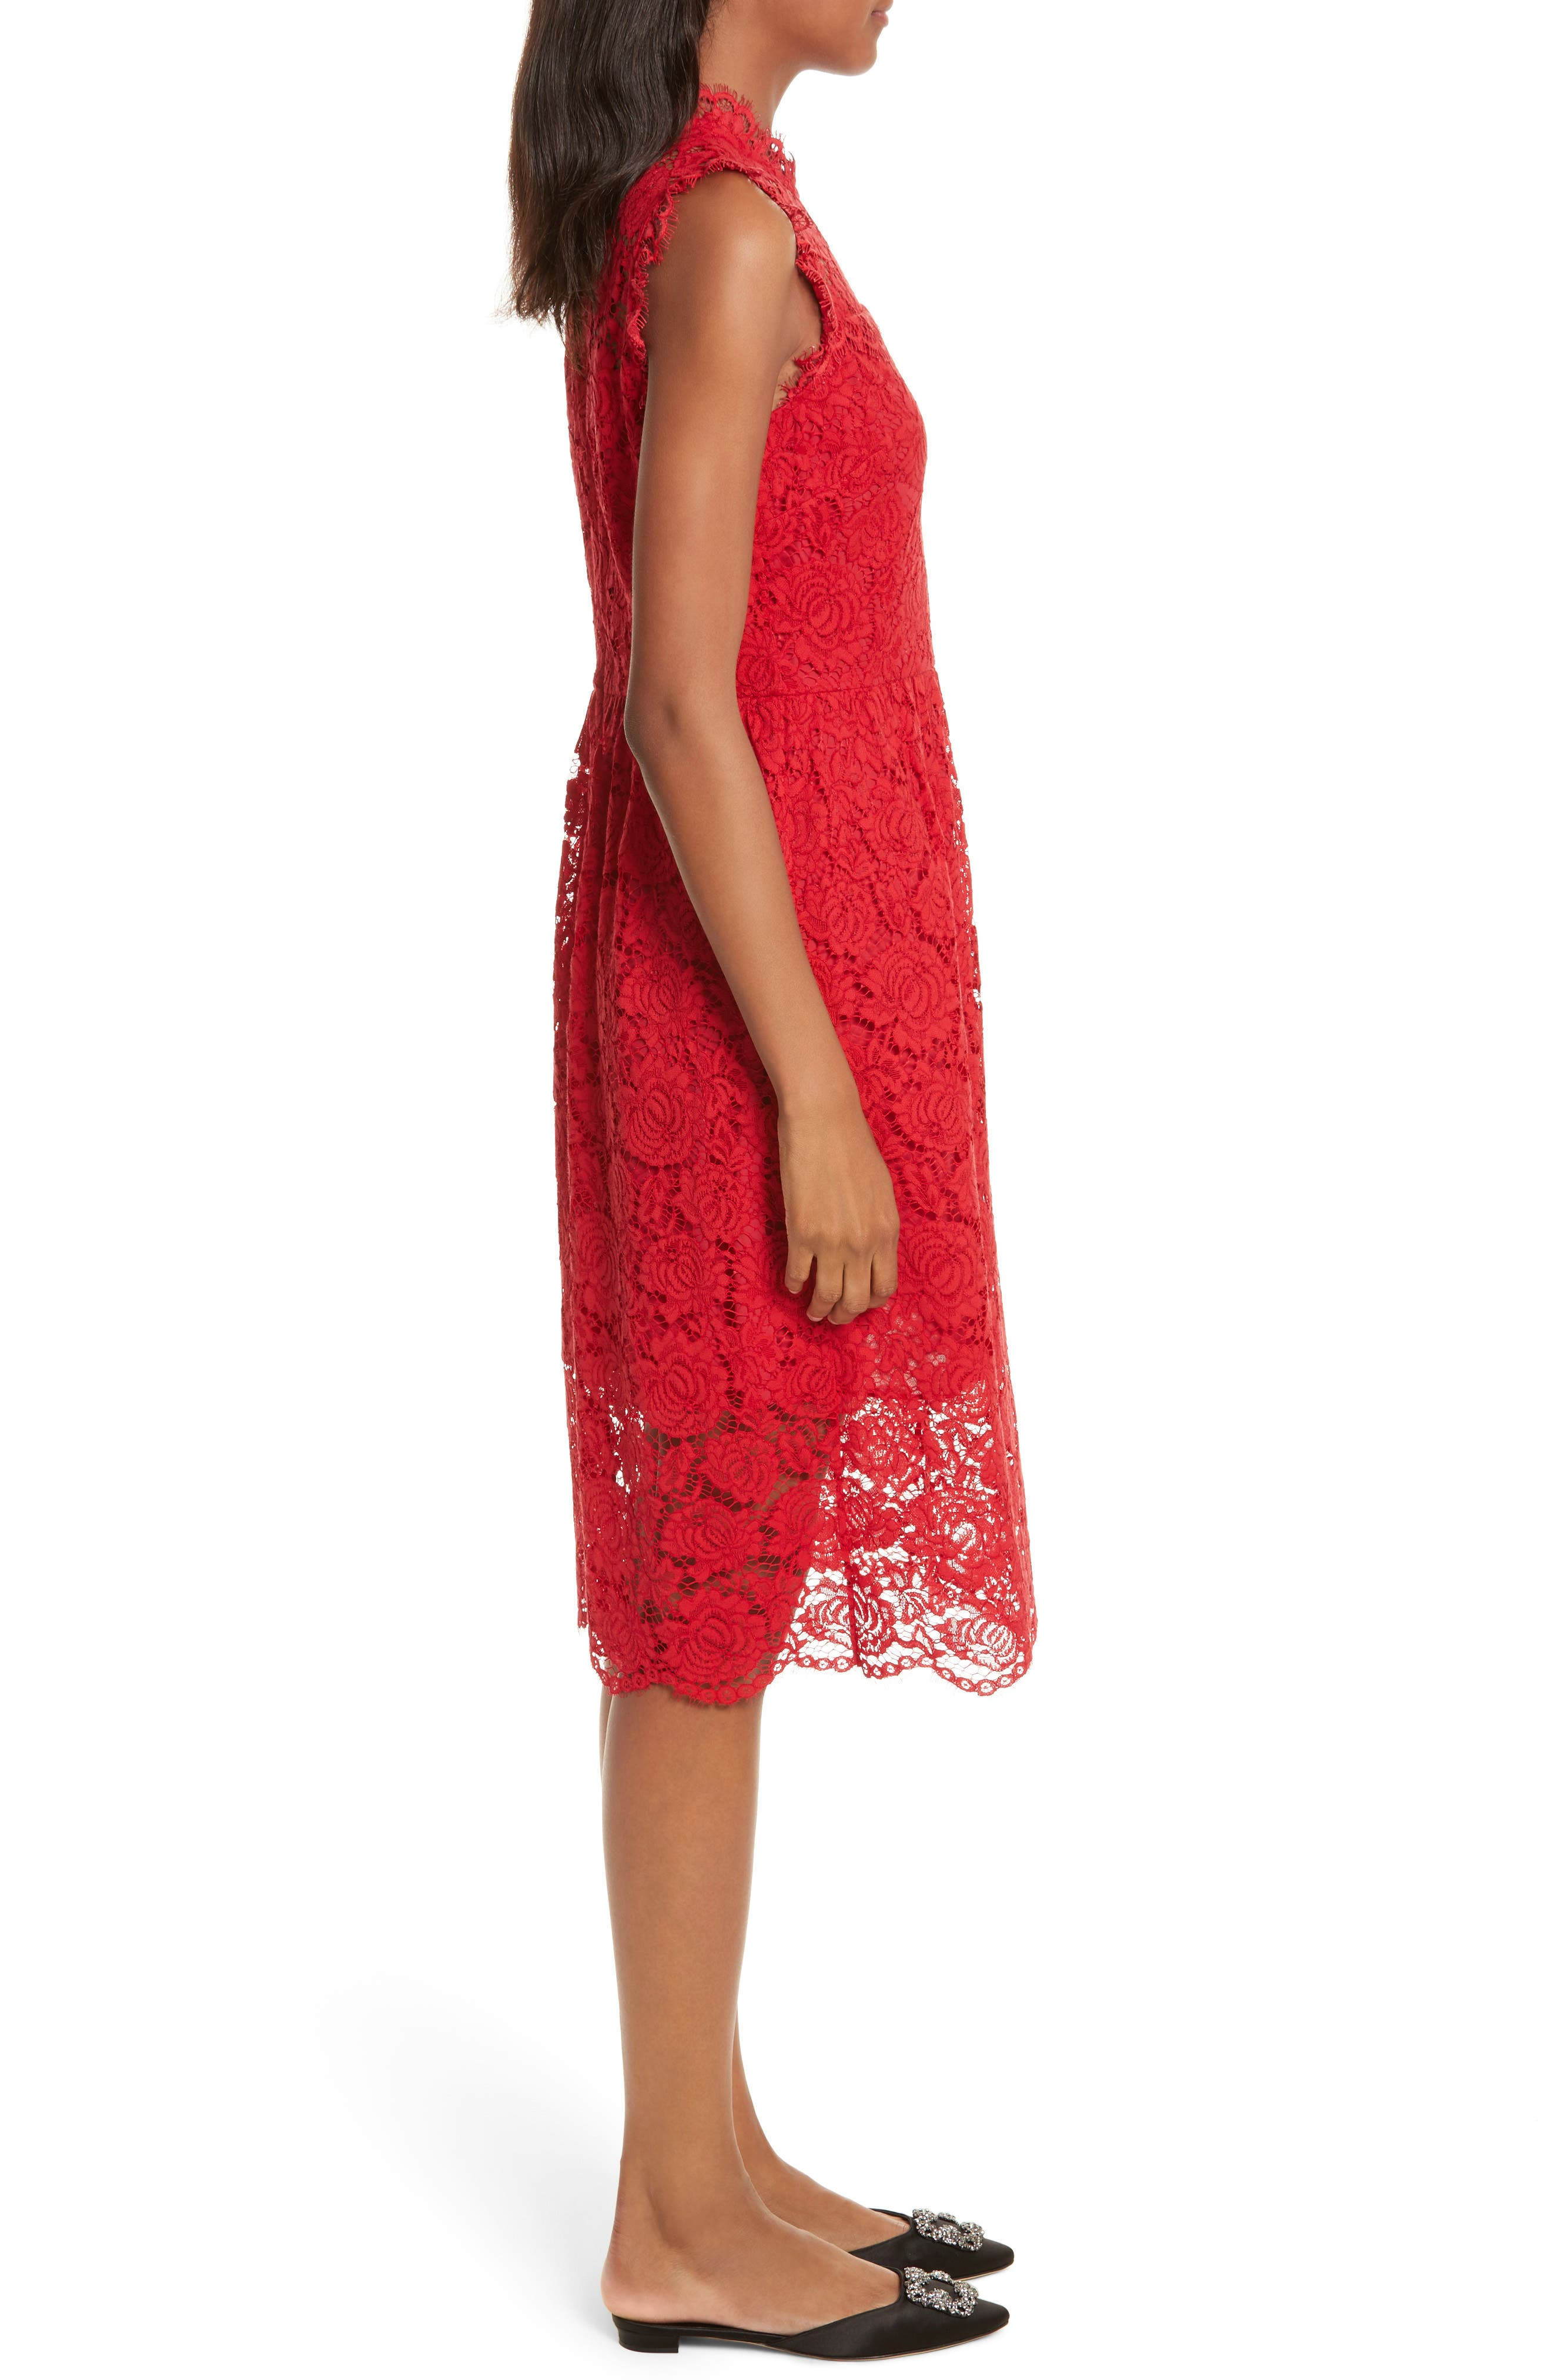 kate spade poppy lace dress,                             Alternate thumbnail 3, color,                             622